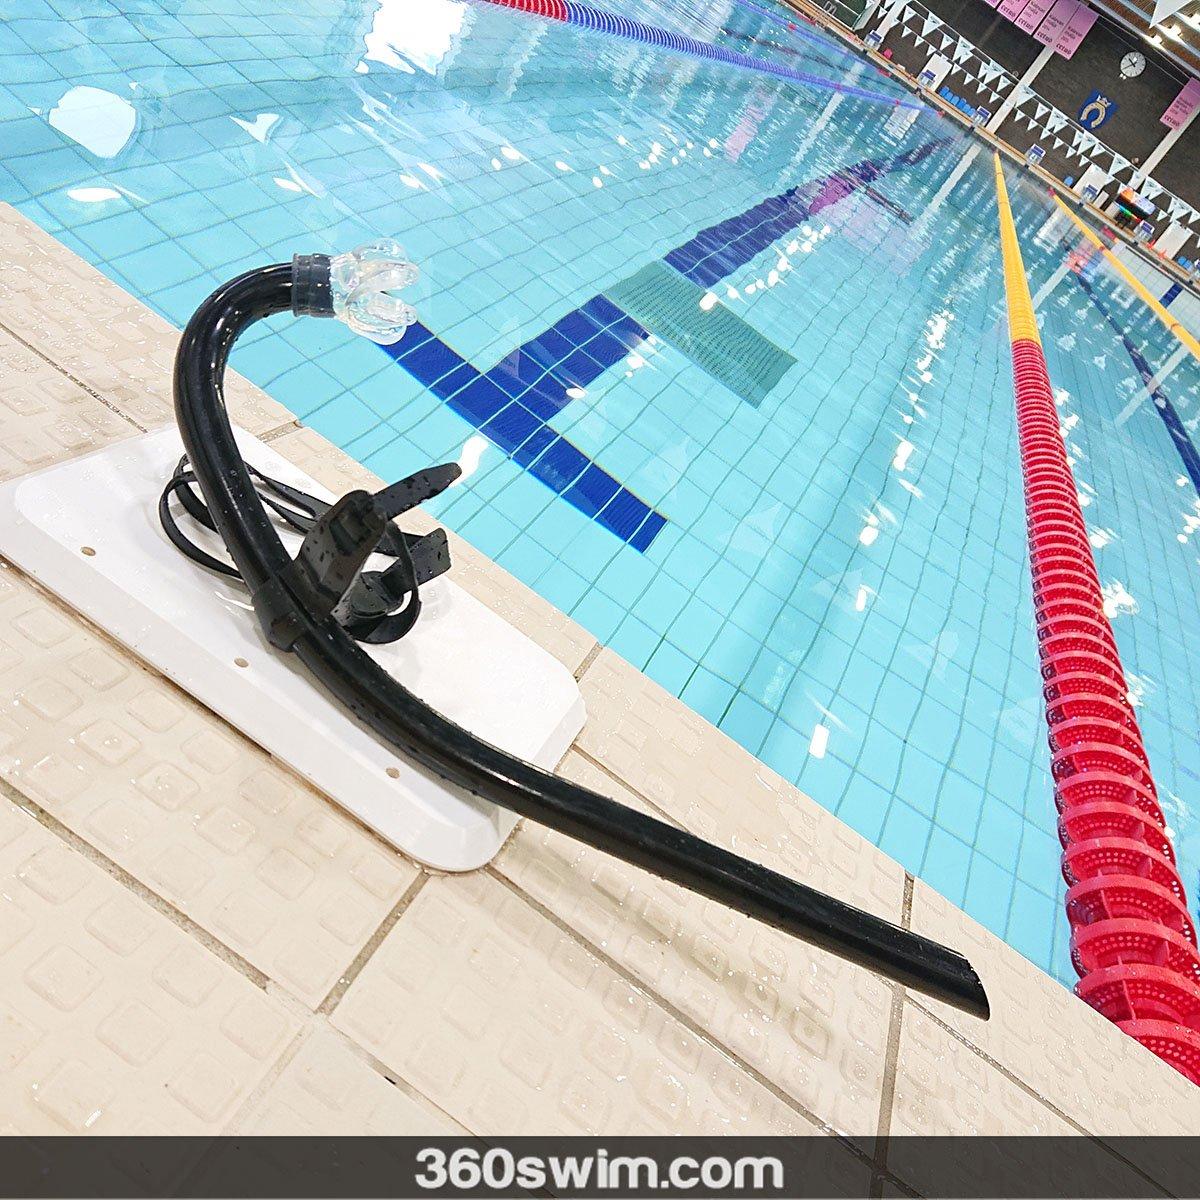 Simple small tube snorkel